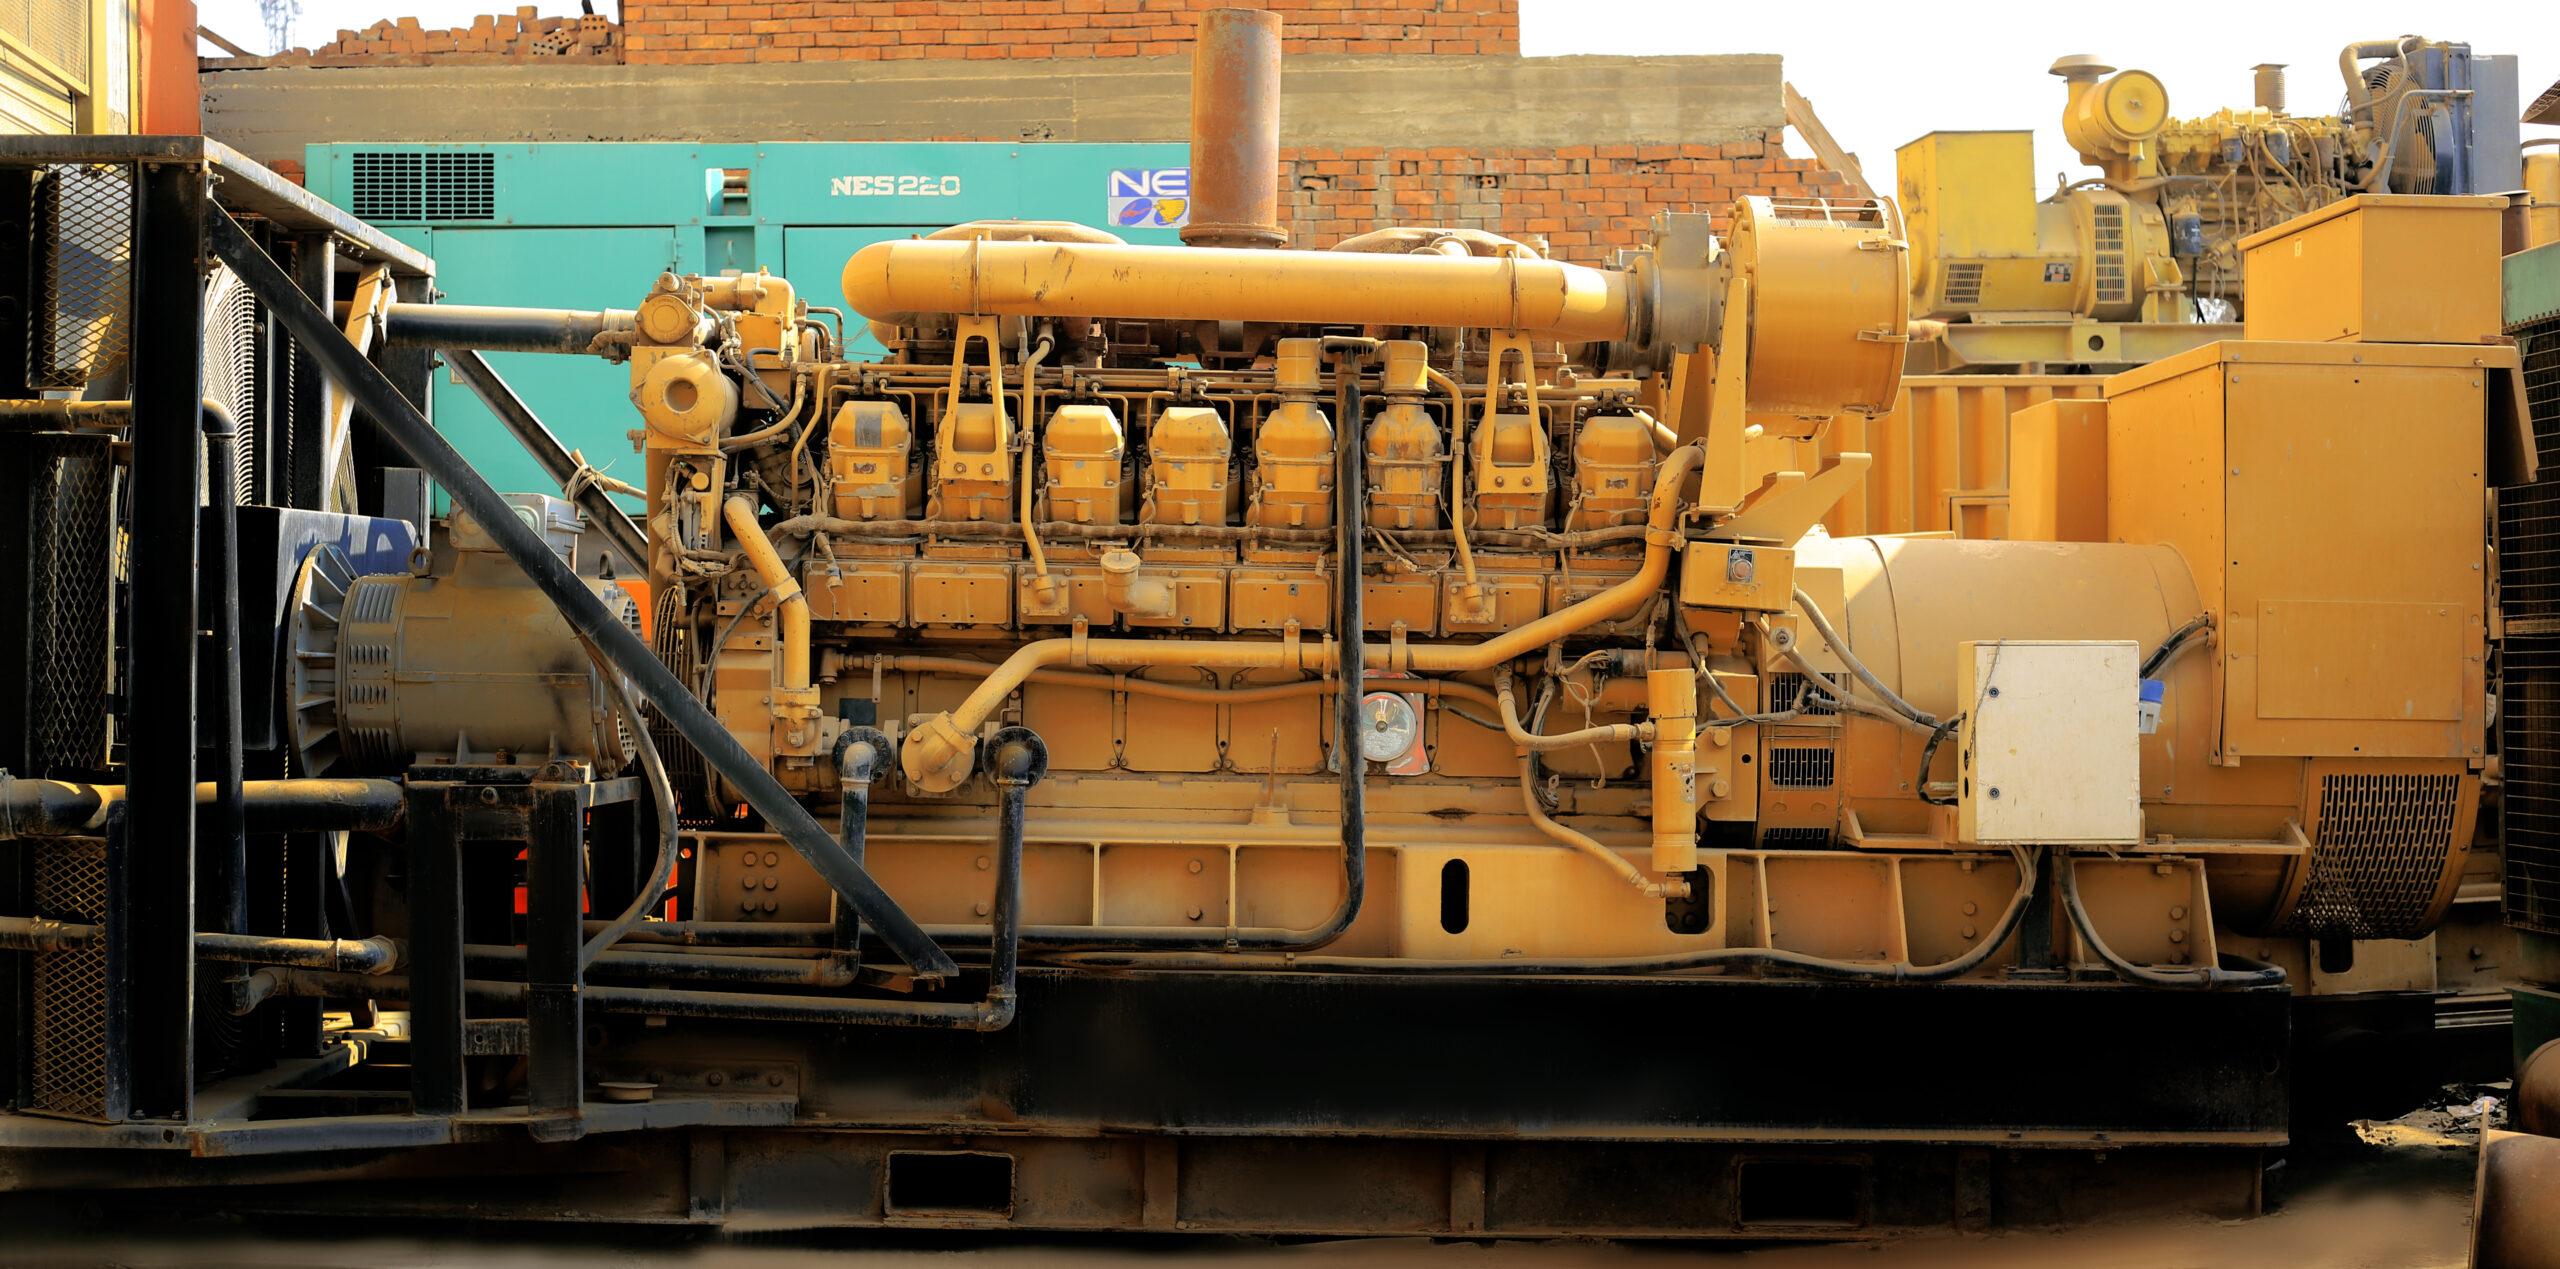 High capacity generators